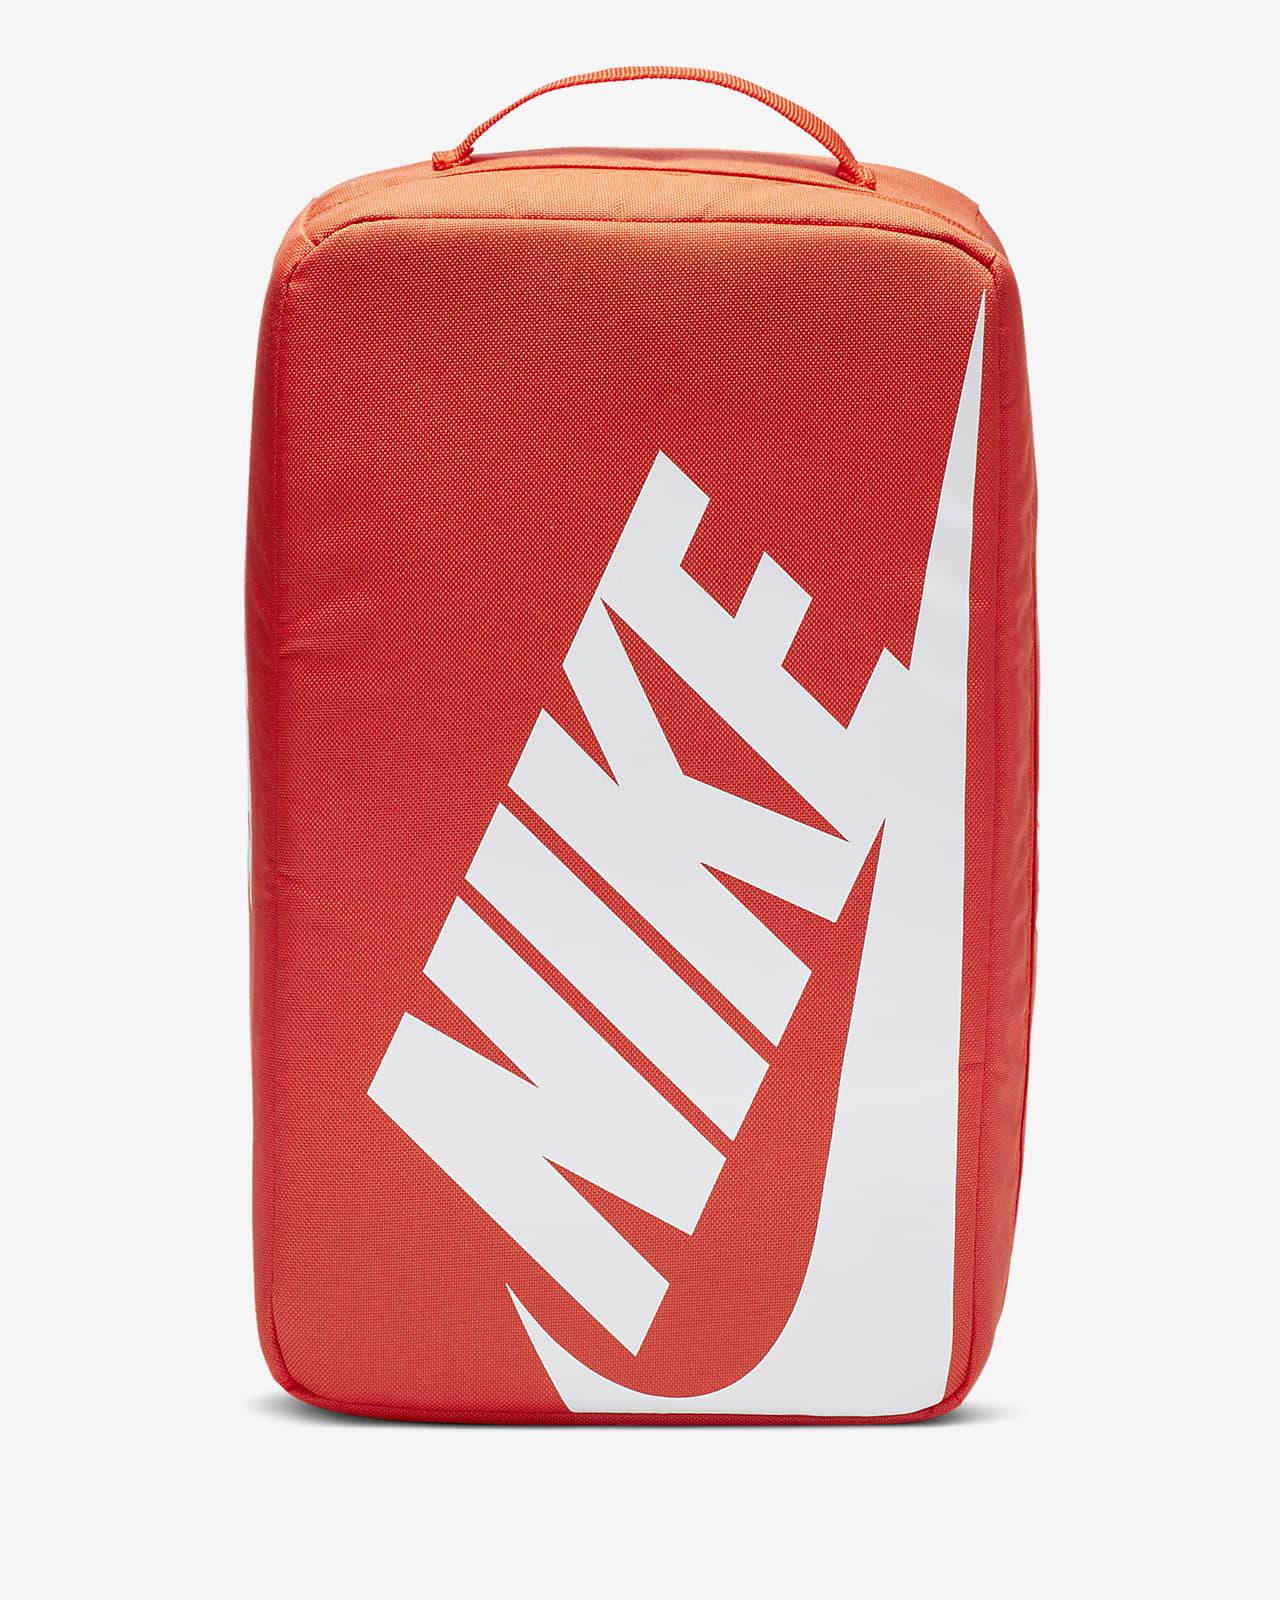 Sac Nike Shoebox